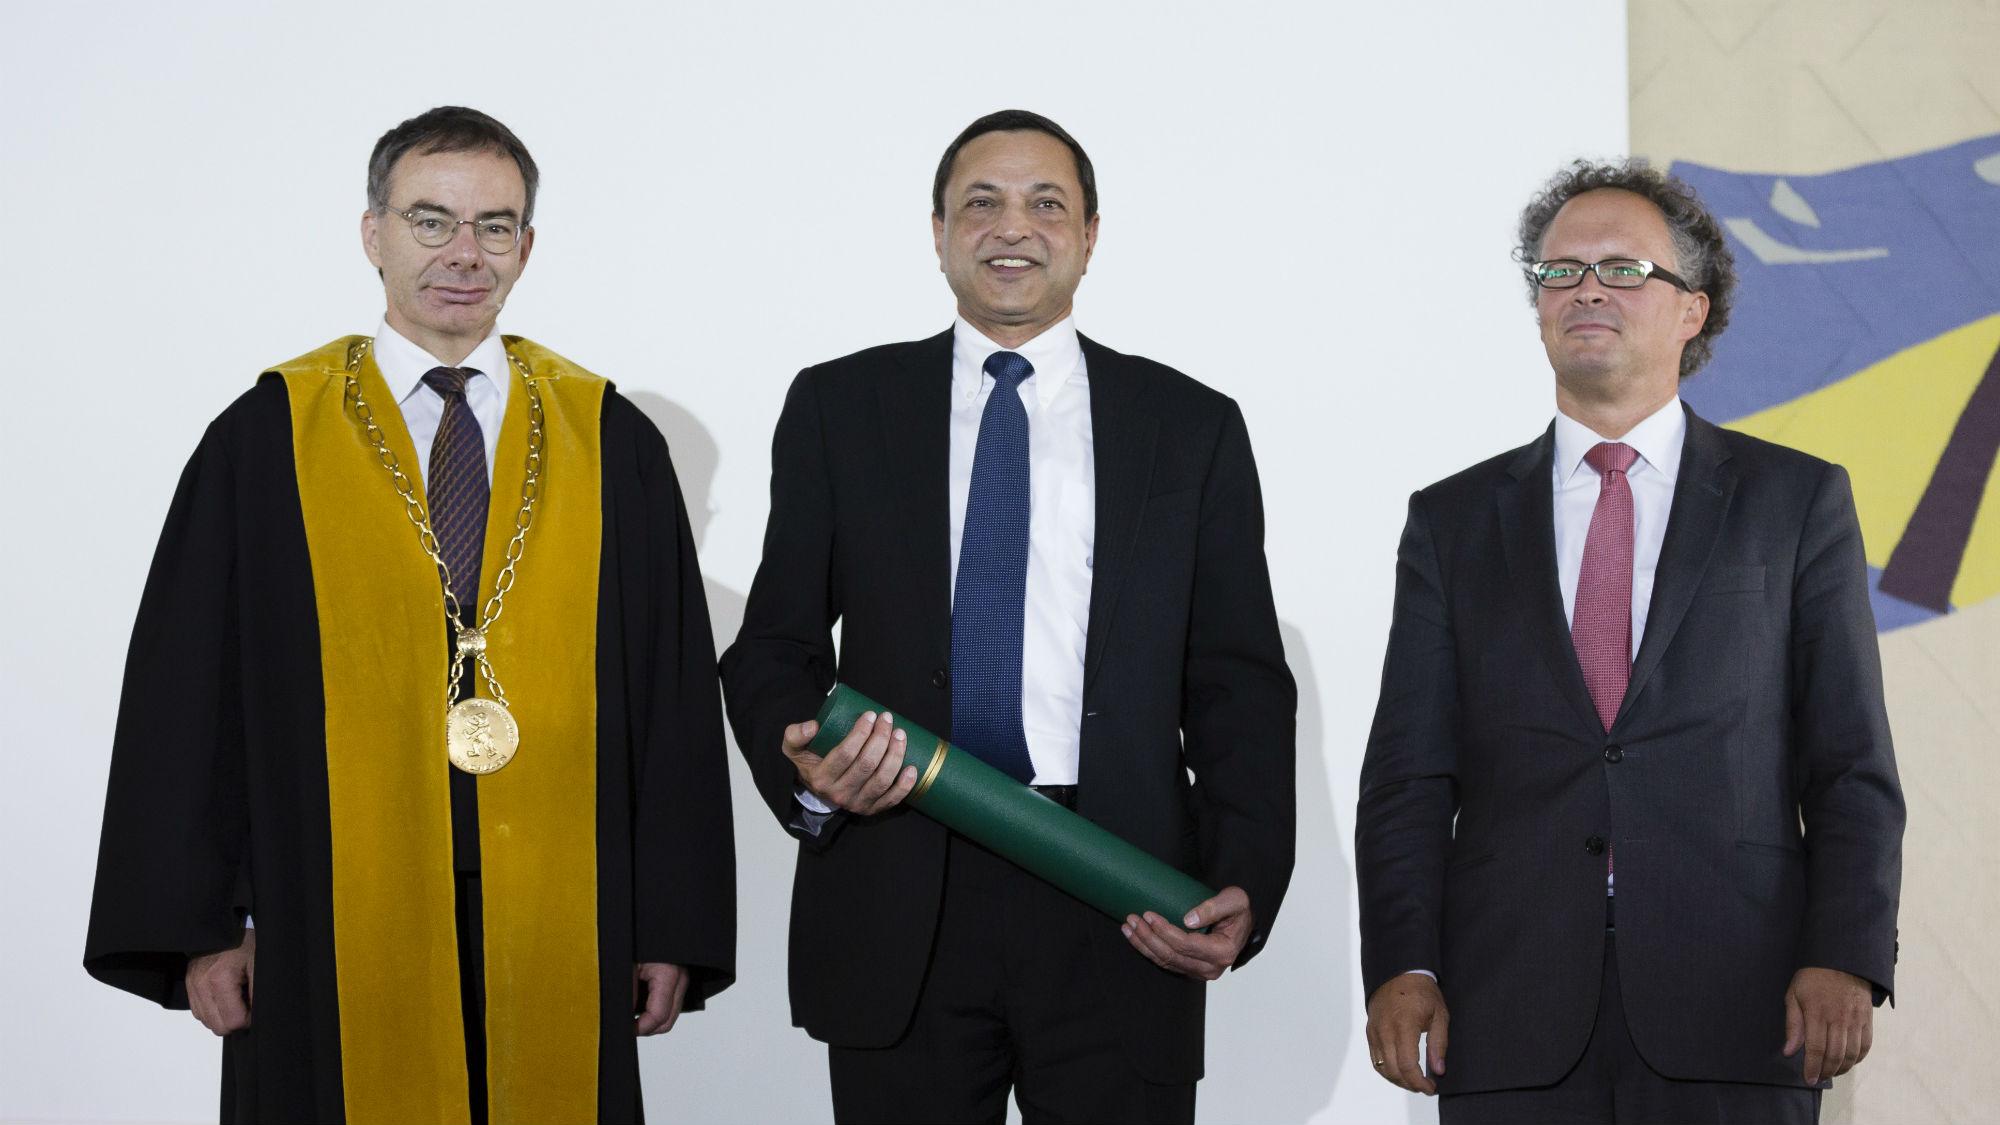 Ajaj Kohli Übergabe Ehrendoktor 2016